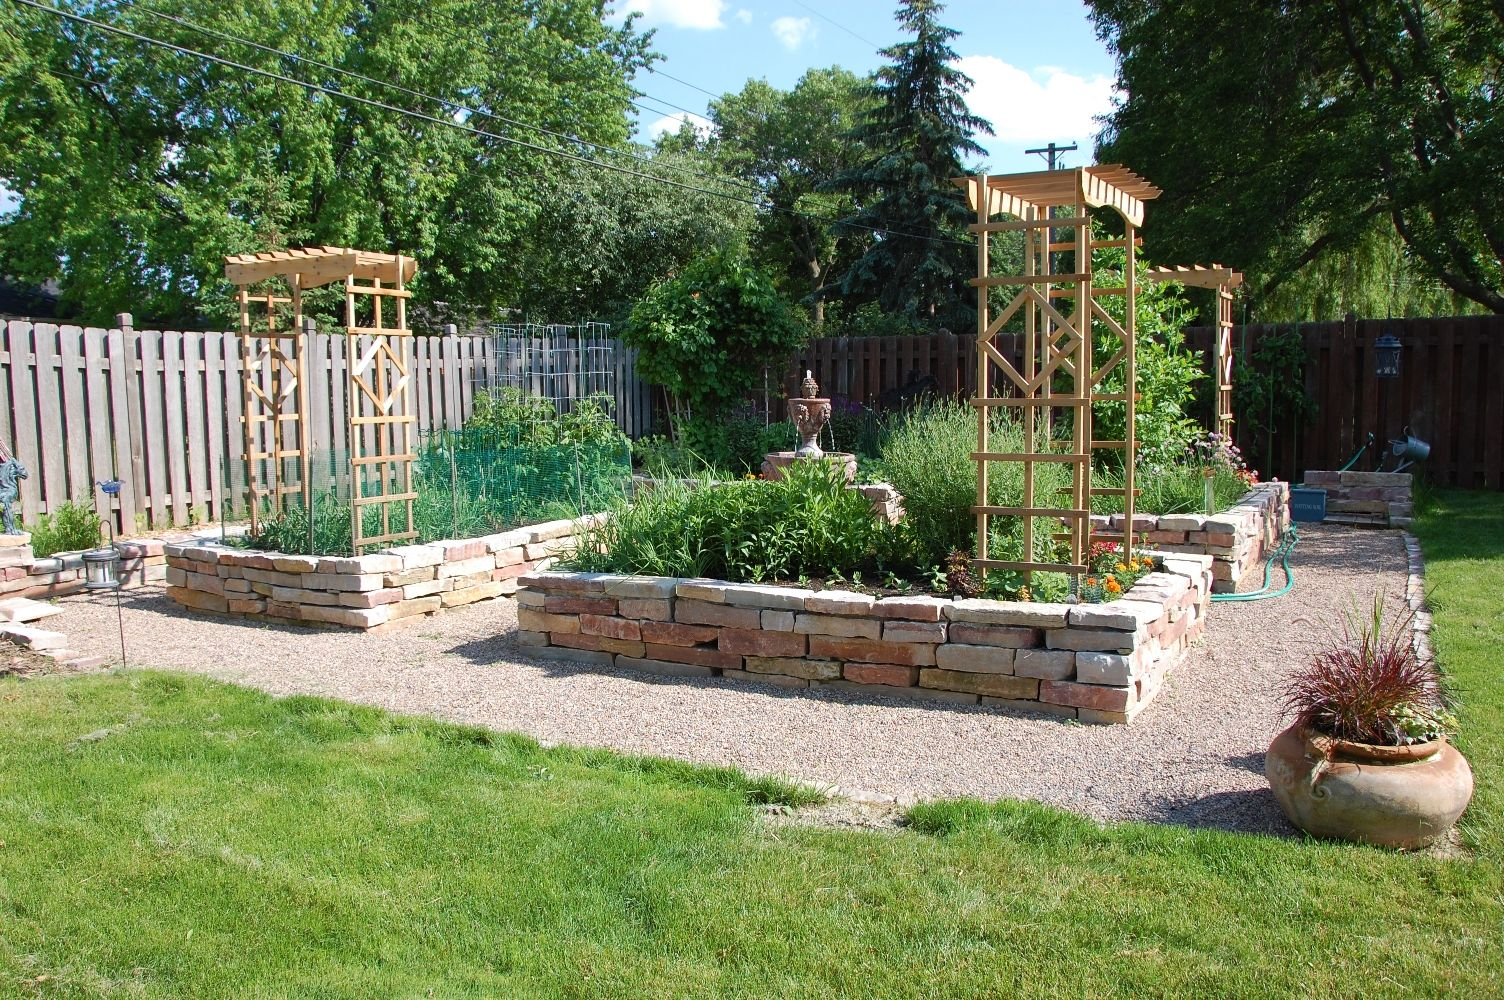 Design and Build Your Own Raised Garden Bed   Watters Garden Center